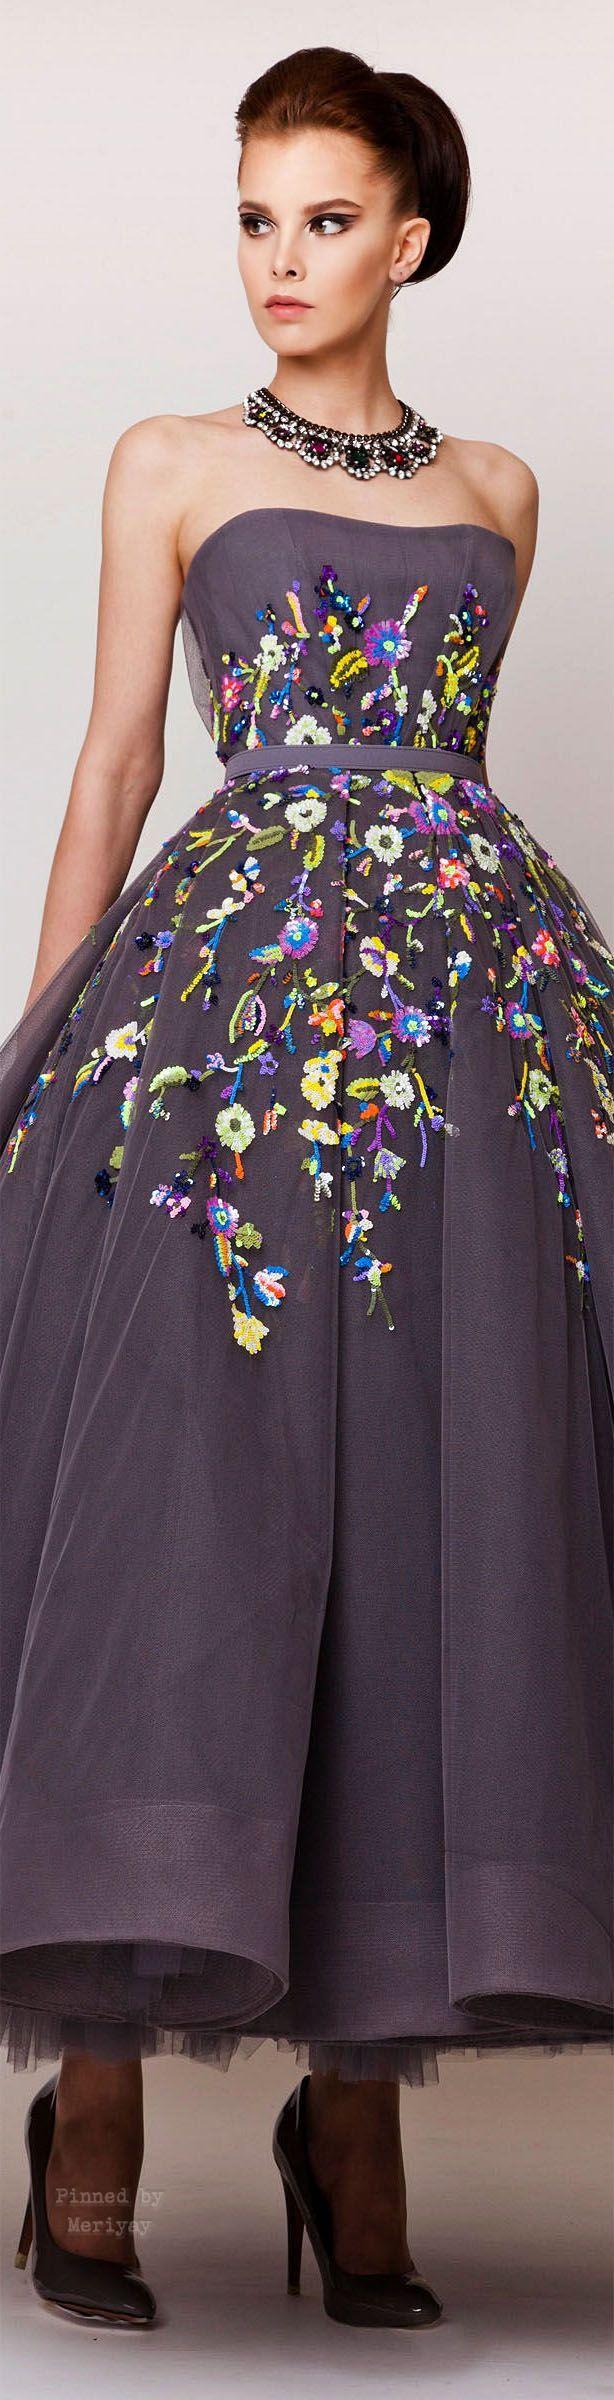 The best images about dresses on pinterest vintage dresses